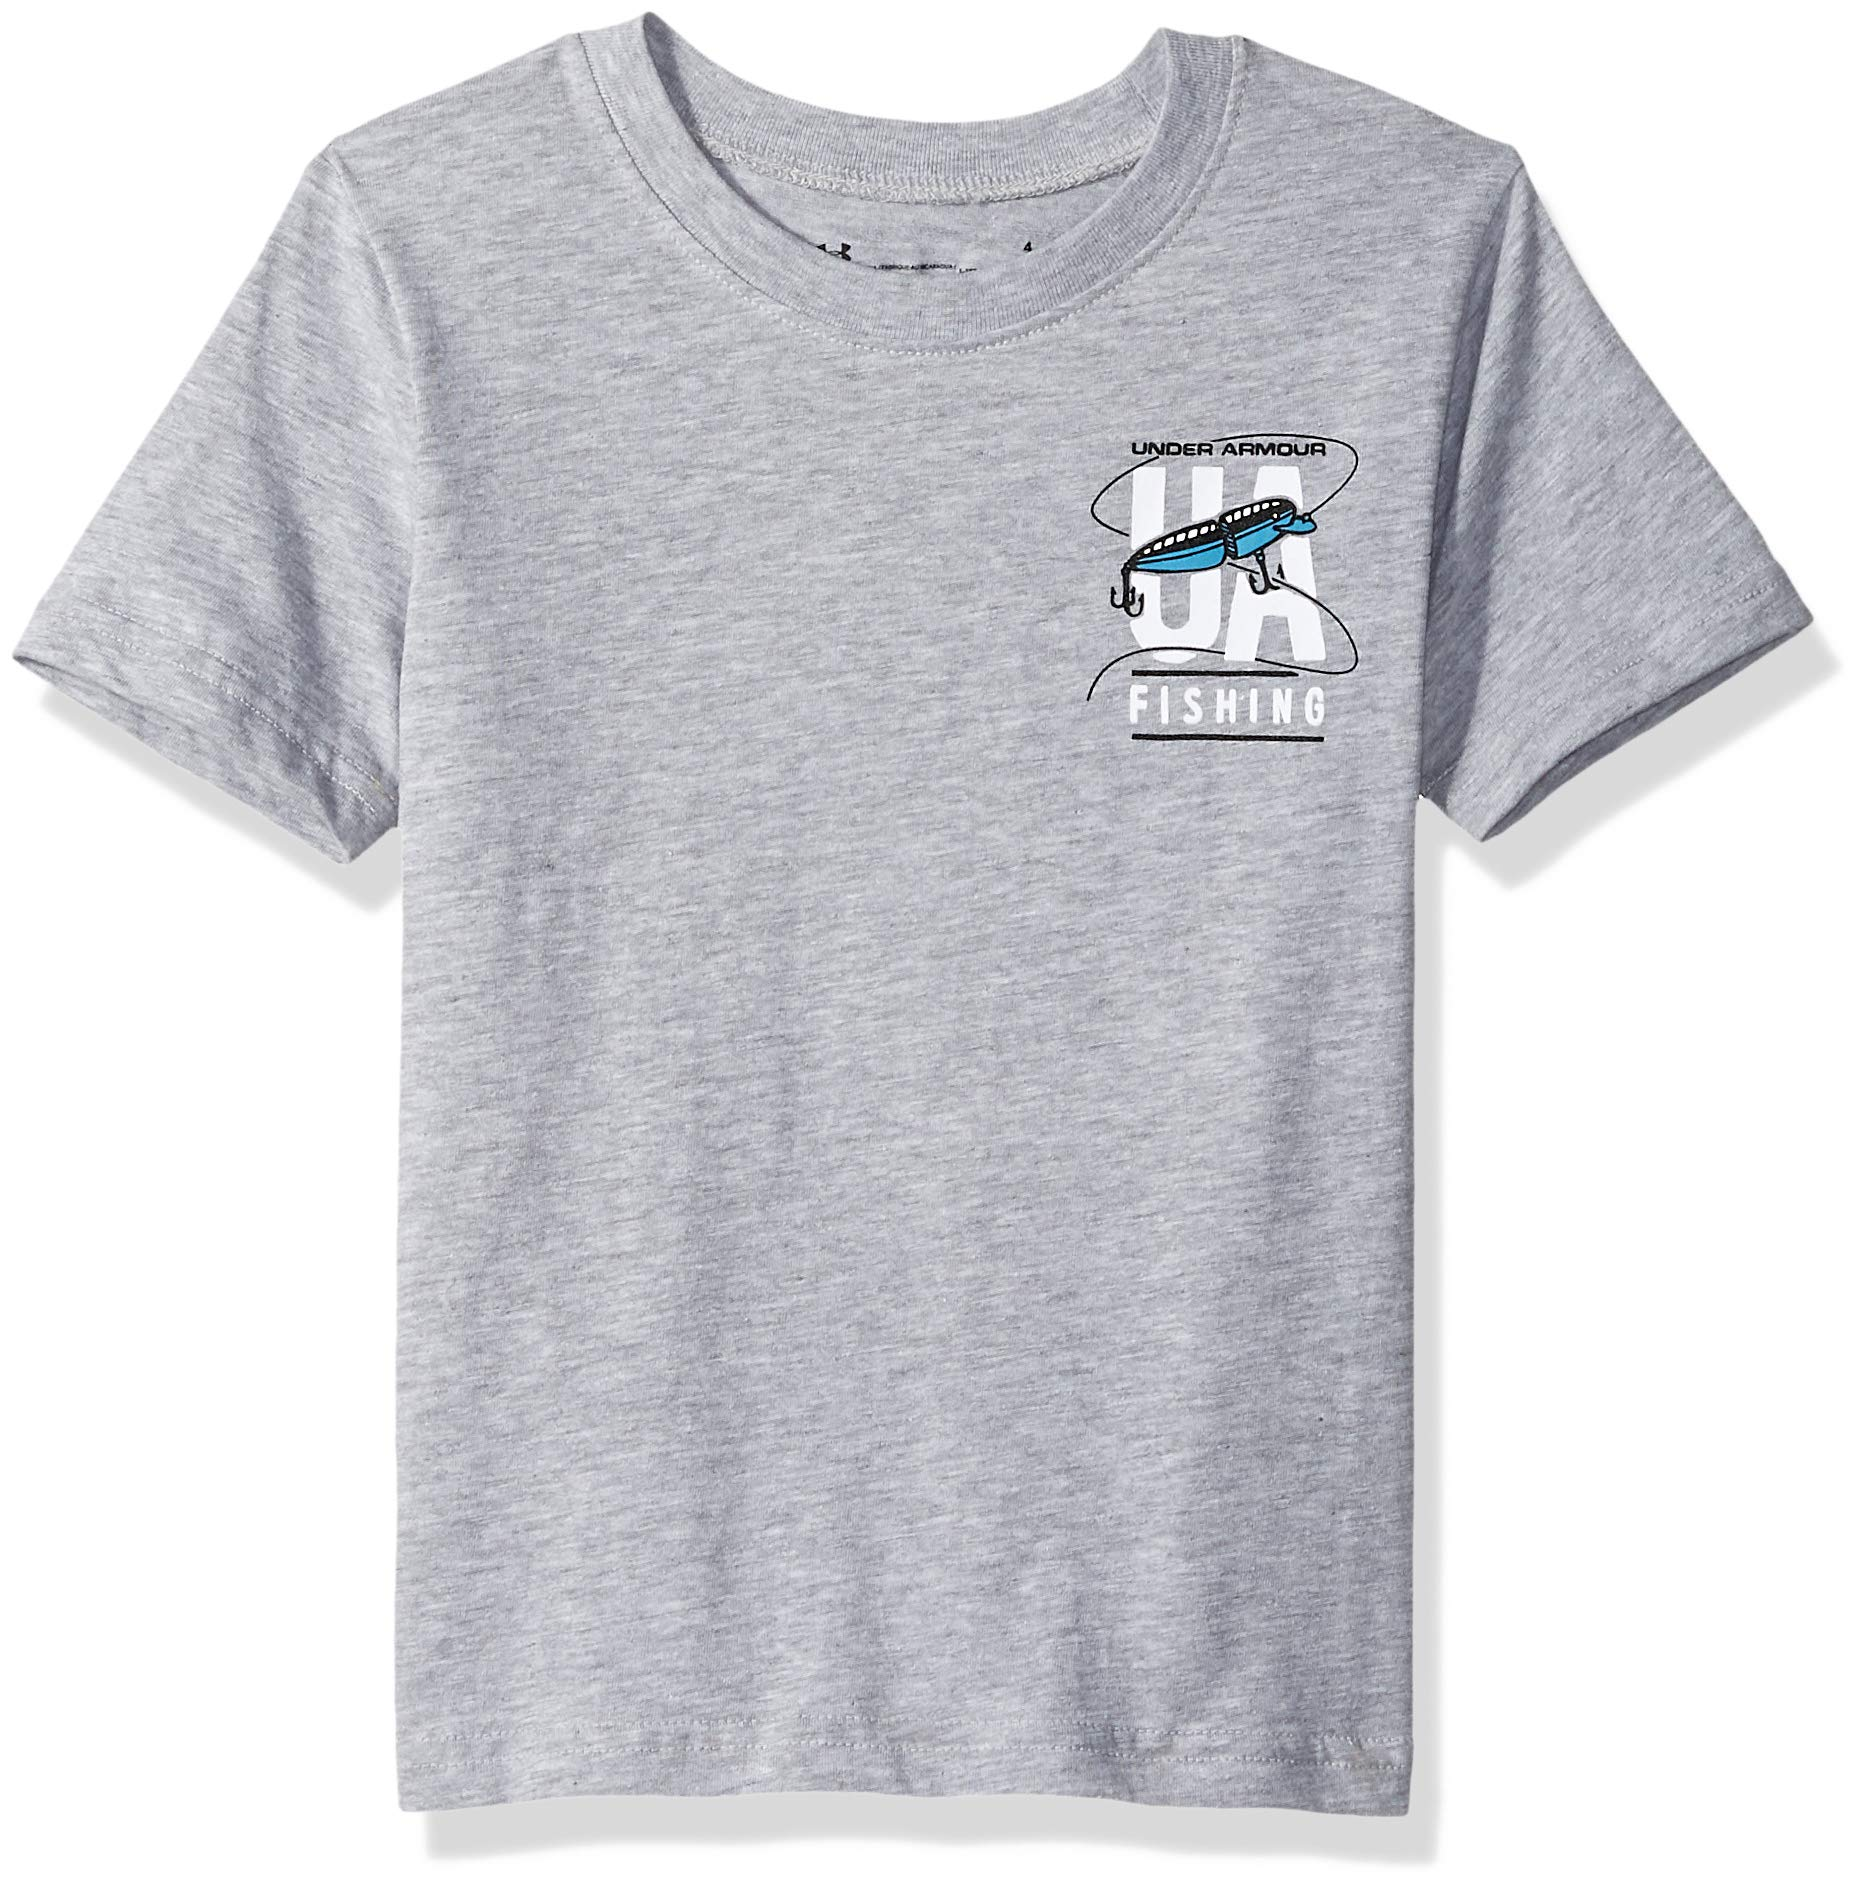 Under Armour Boys' Little Graphic SS Tee Shirt, Light/Pastel Gr-S192 6